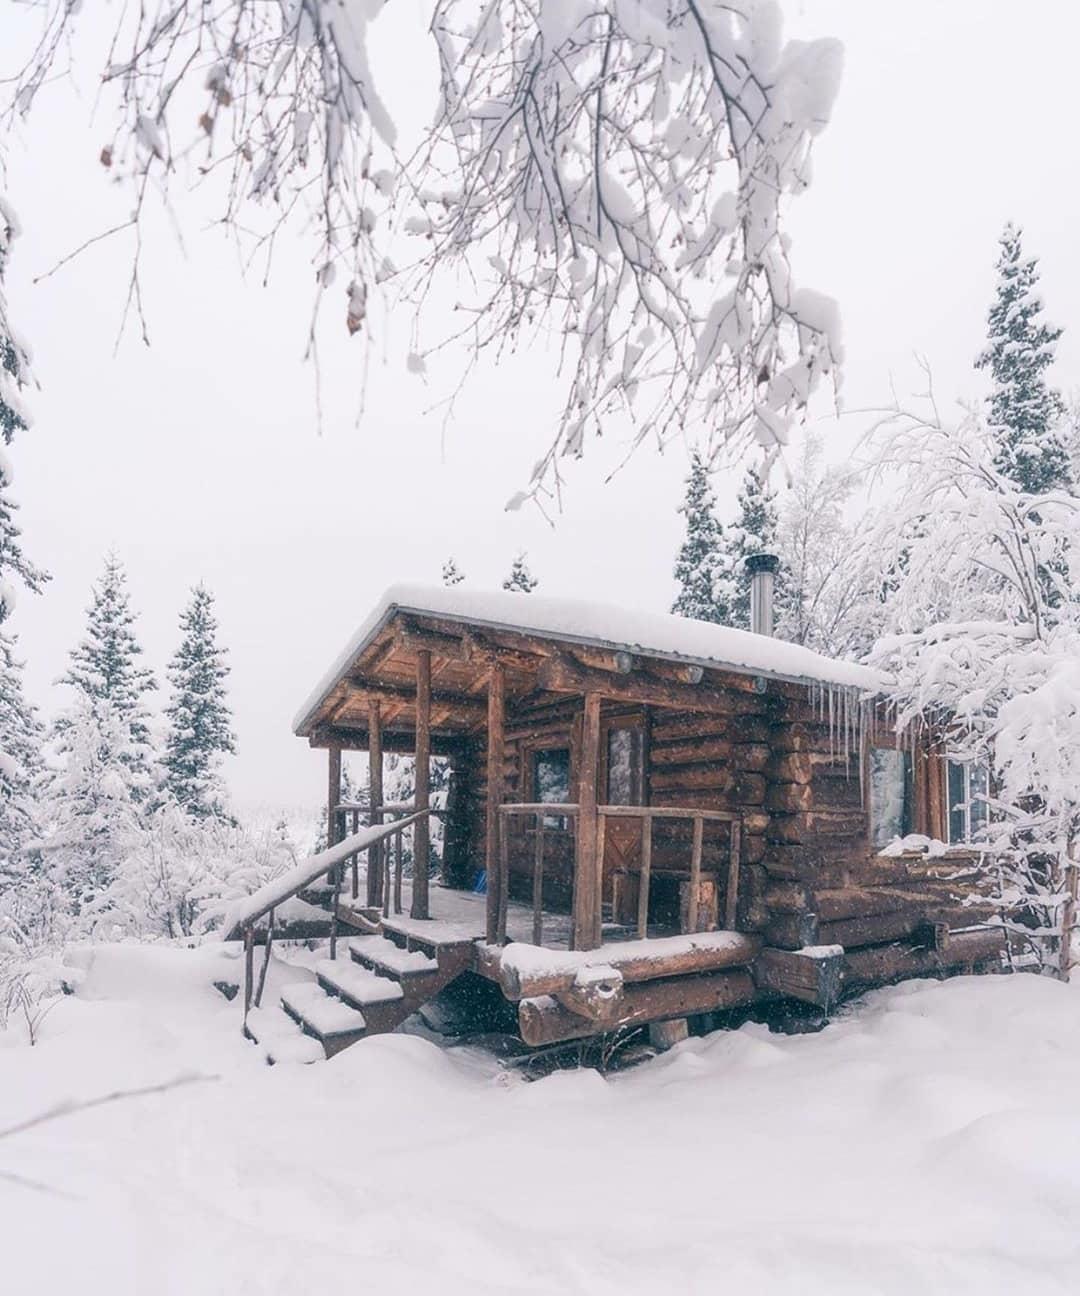 snowy cabin scene